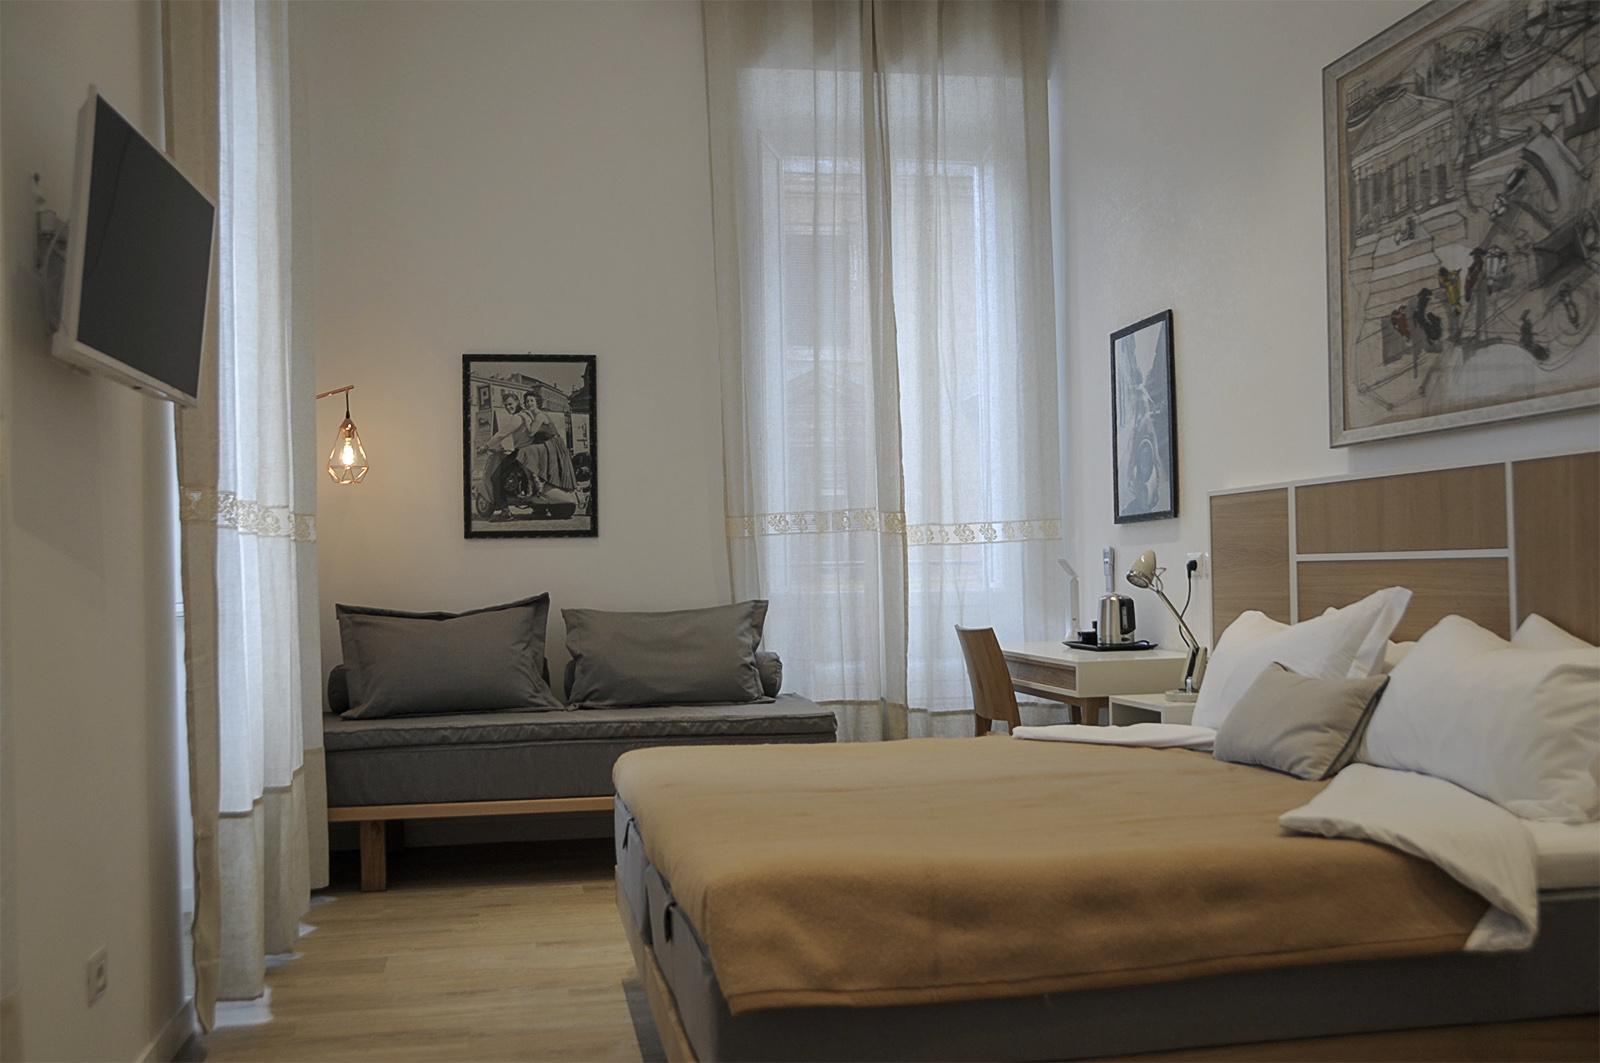 Room #3 Faro Basso